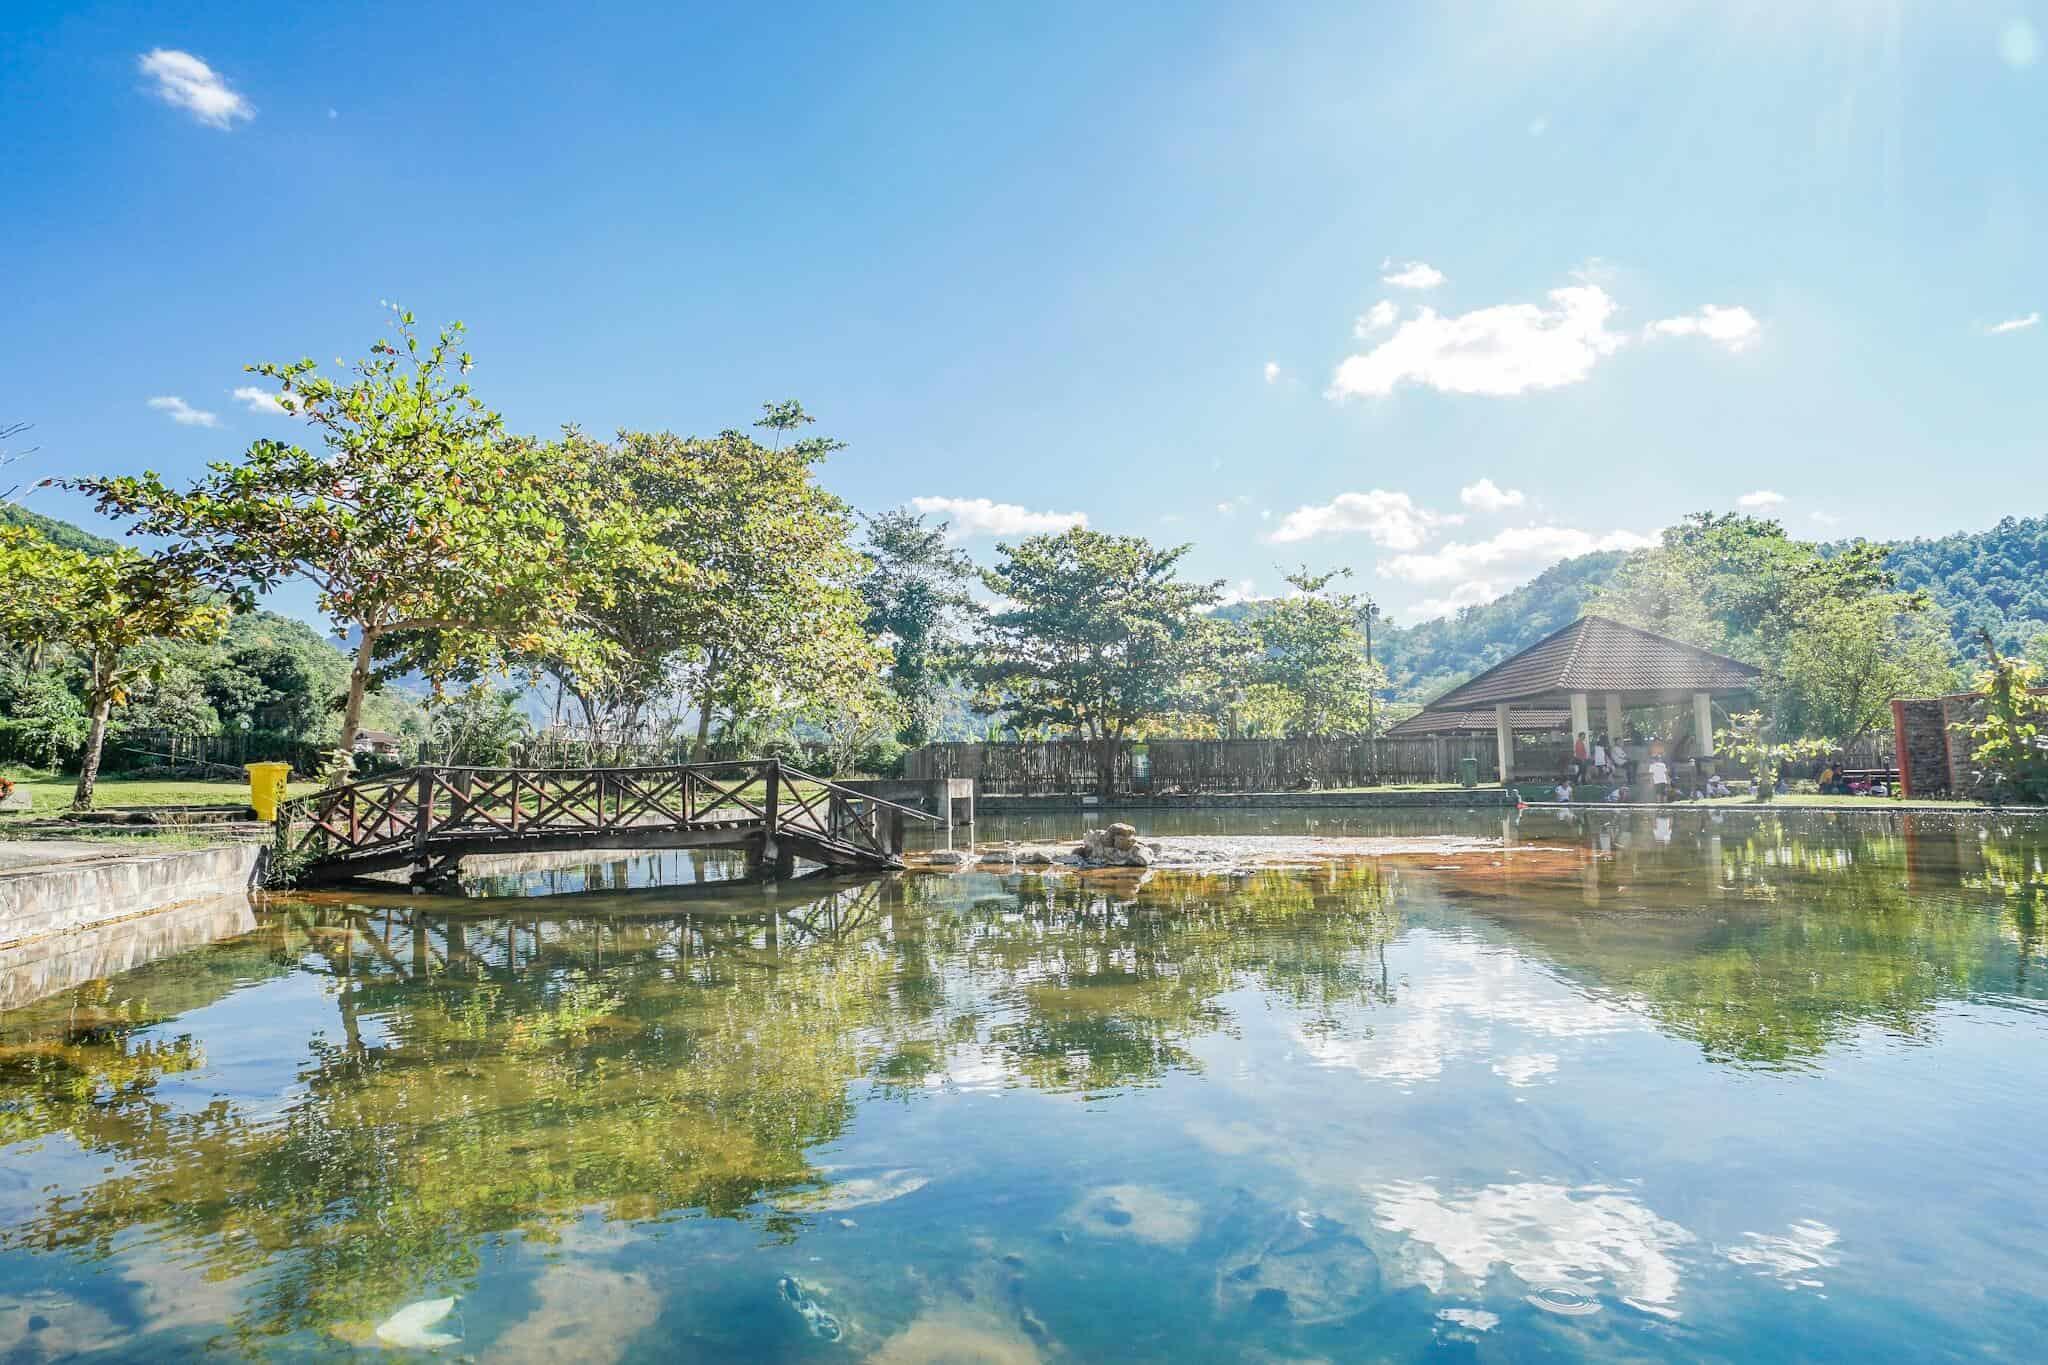 Pha Bong Hot Springs Mae Hong Son